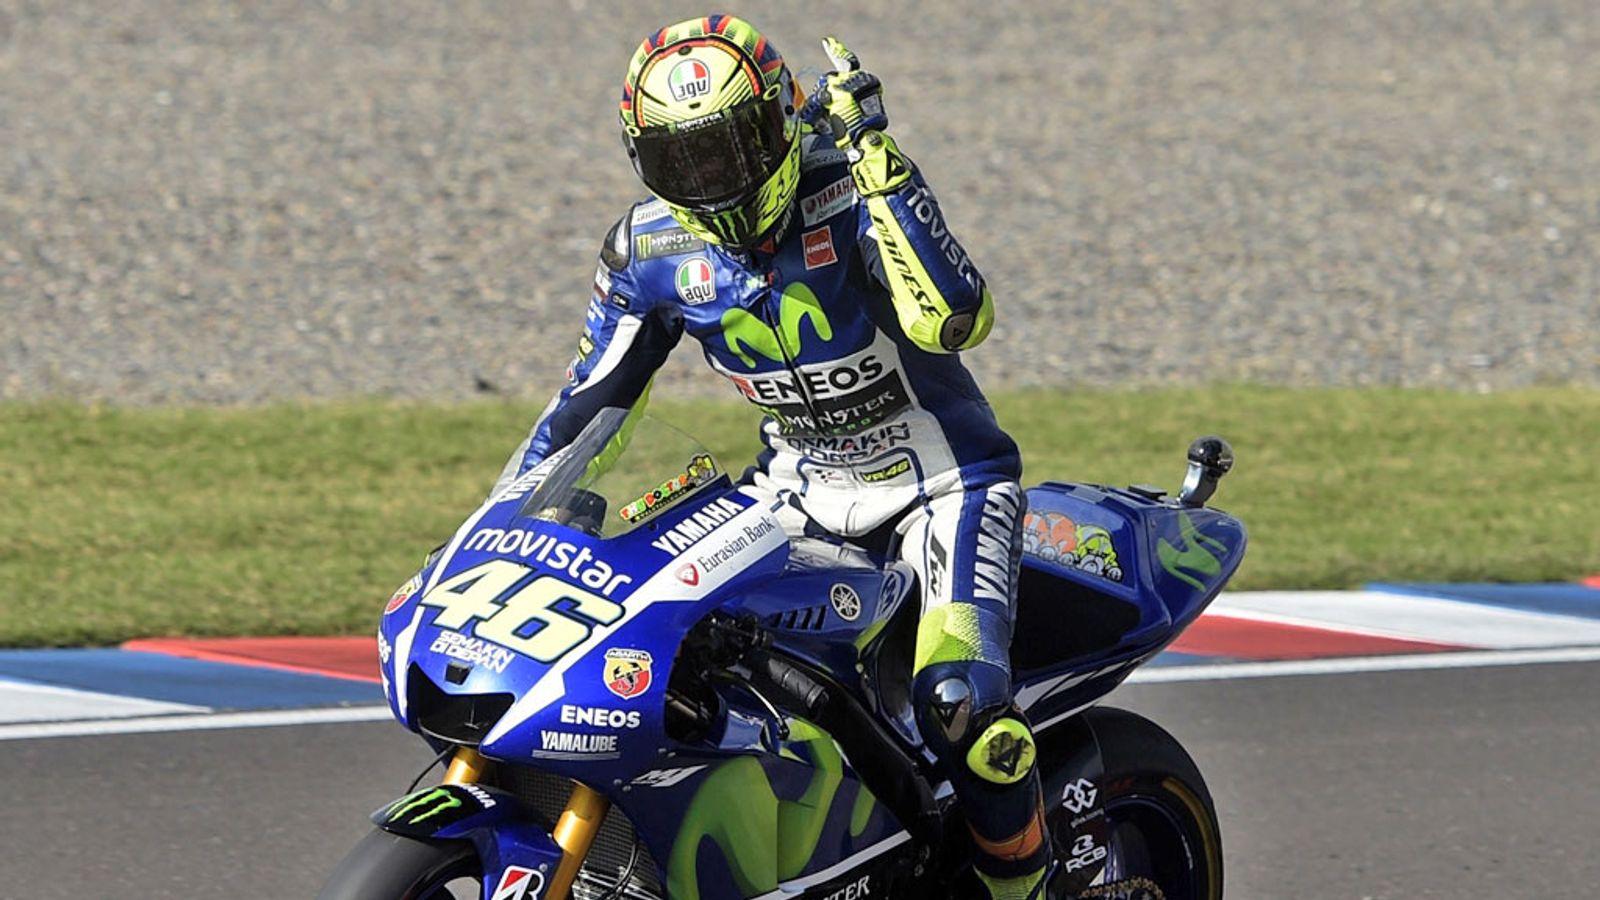 Rossi News